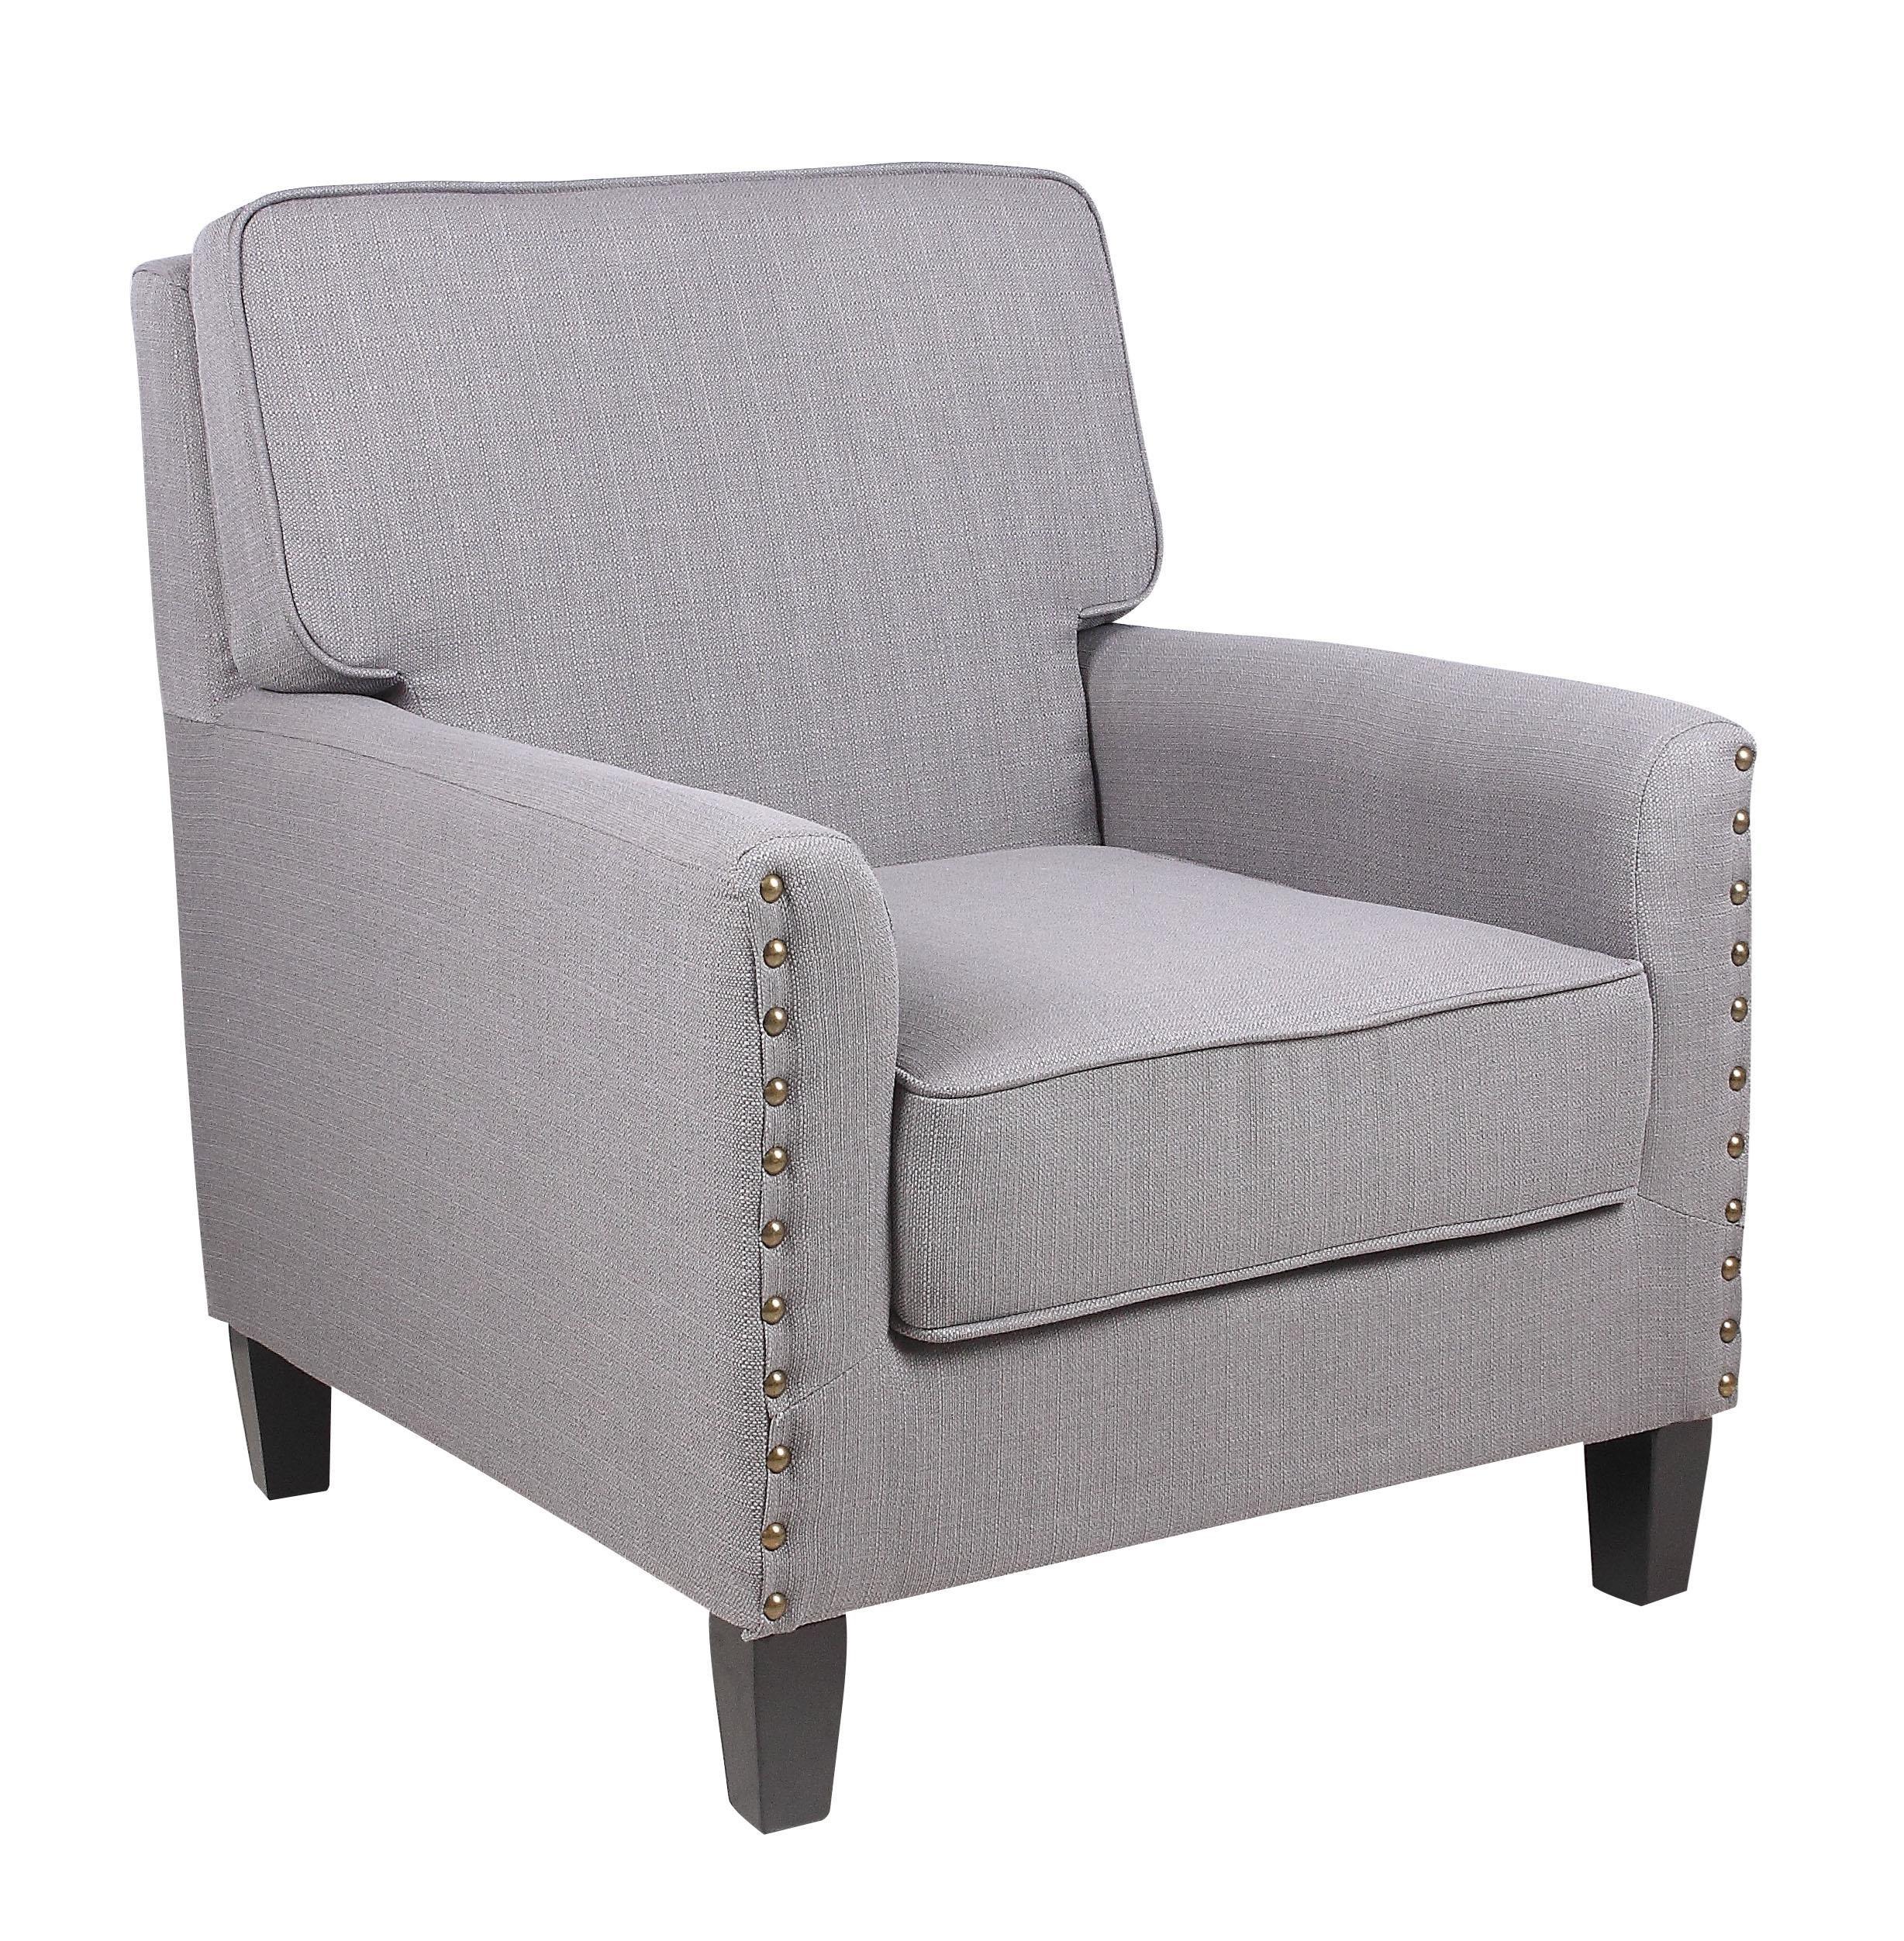 Ashley Furniture Texarkana: Ivan Smith Furniture Ivans Outlet Shreveport Furniture